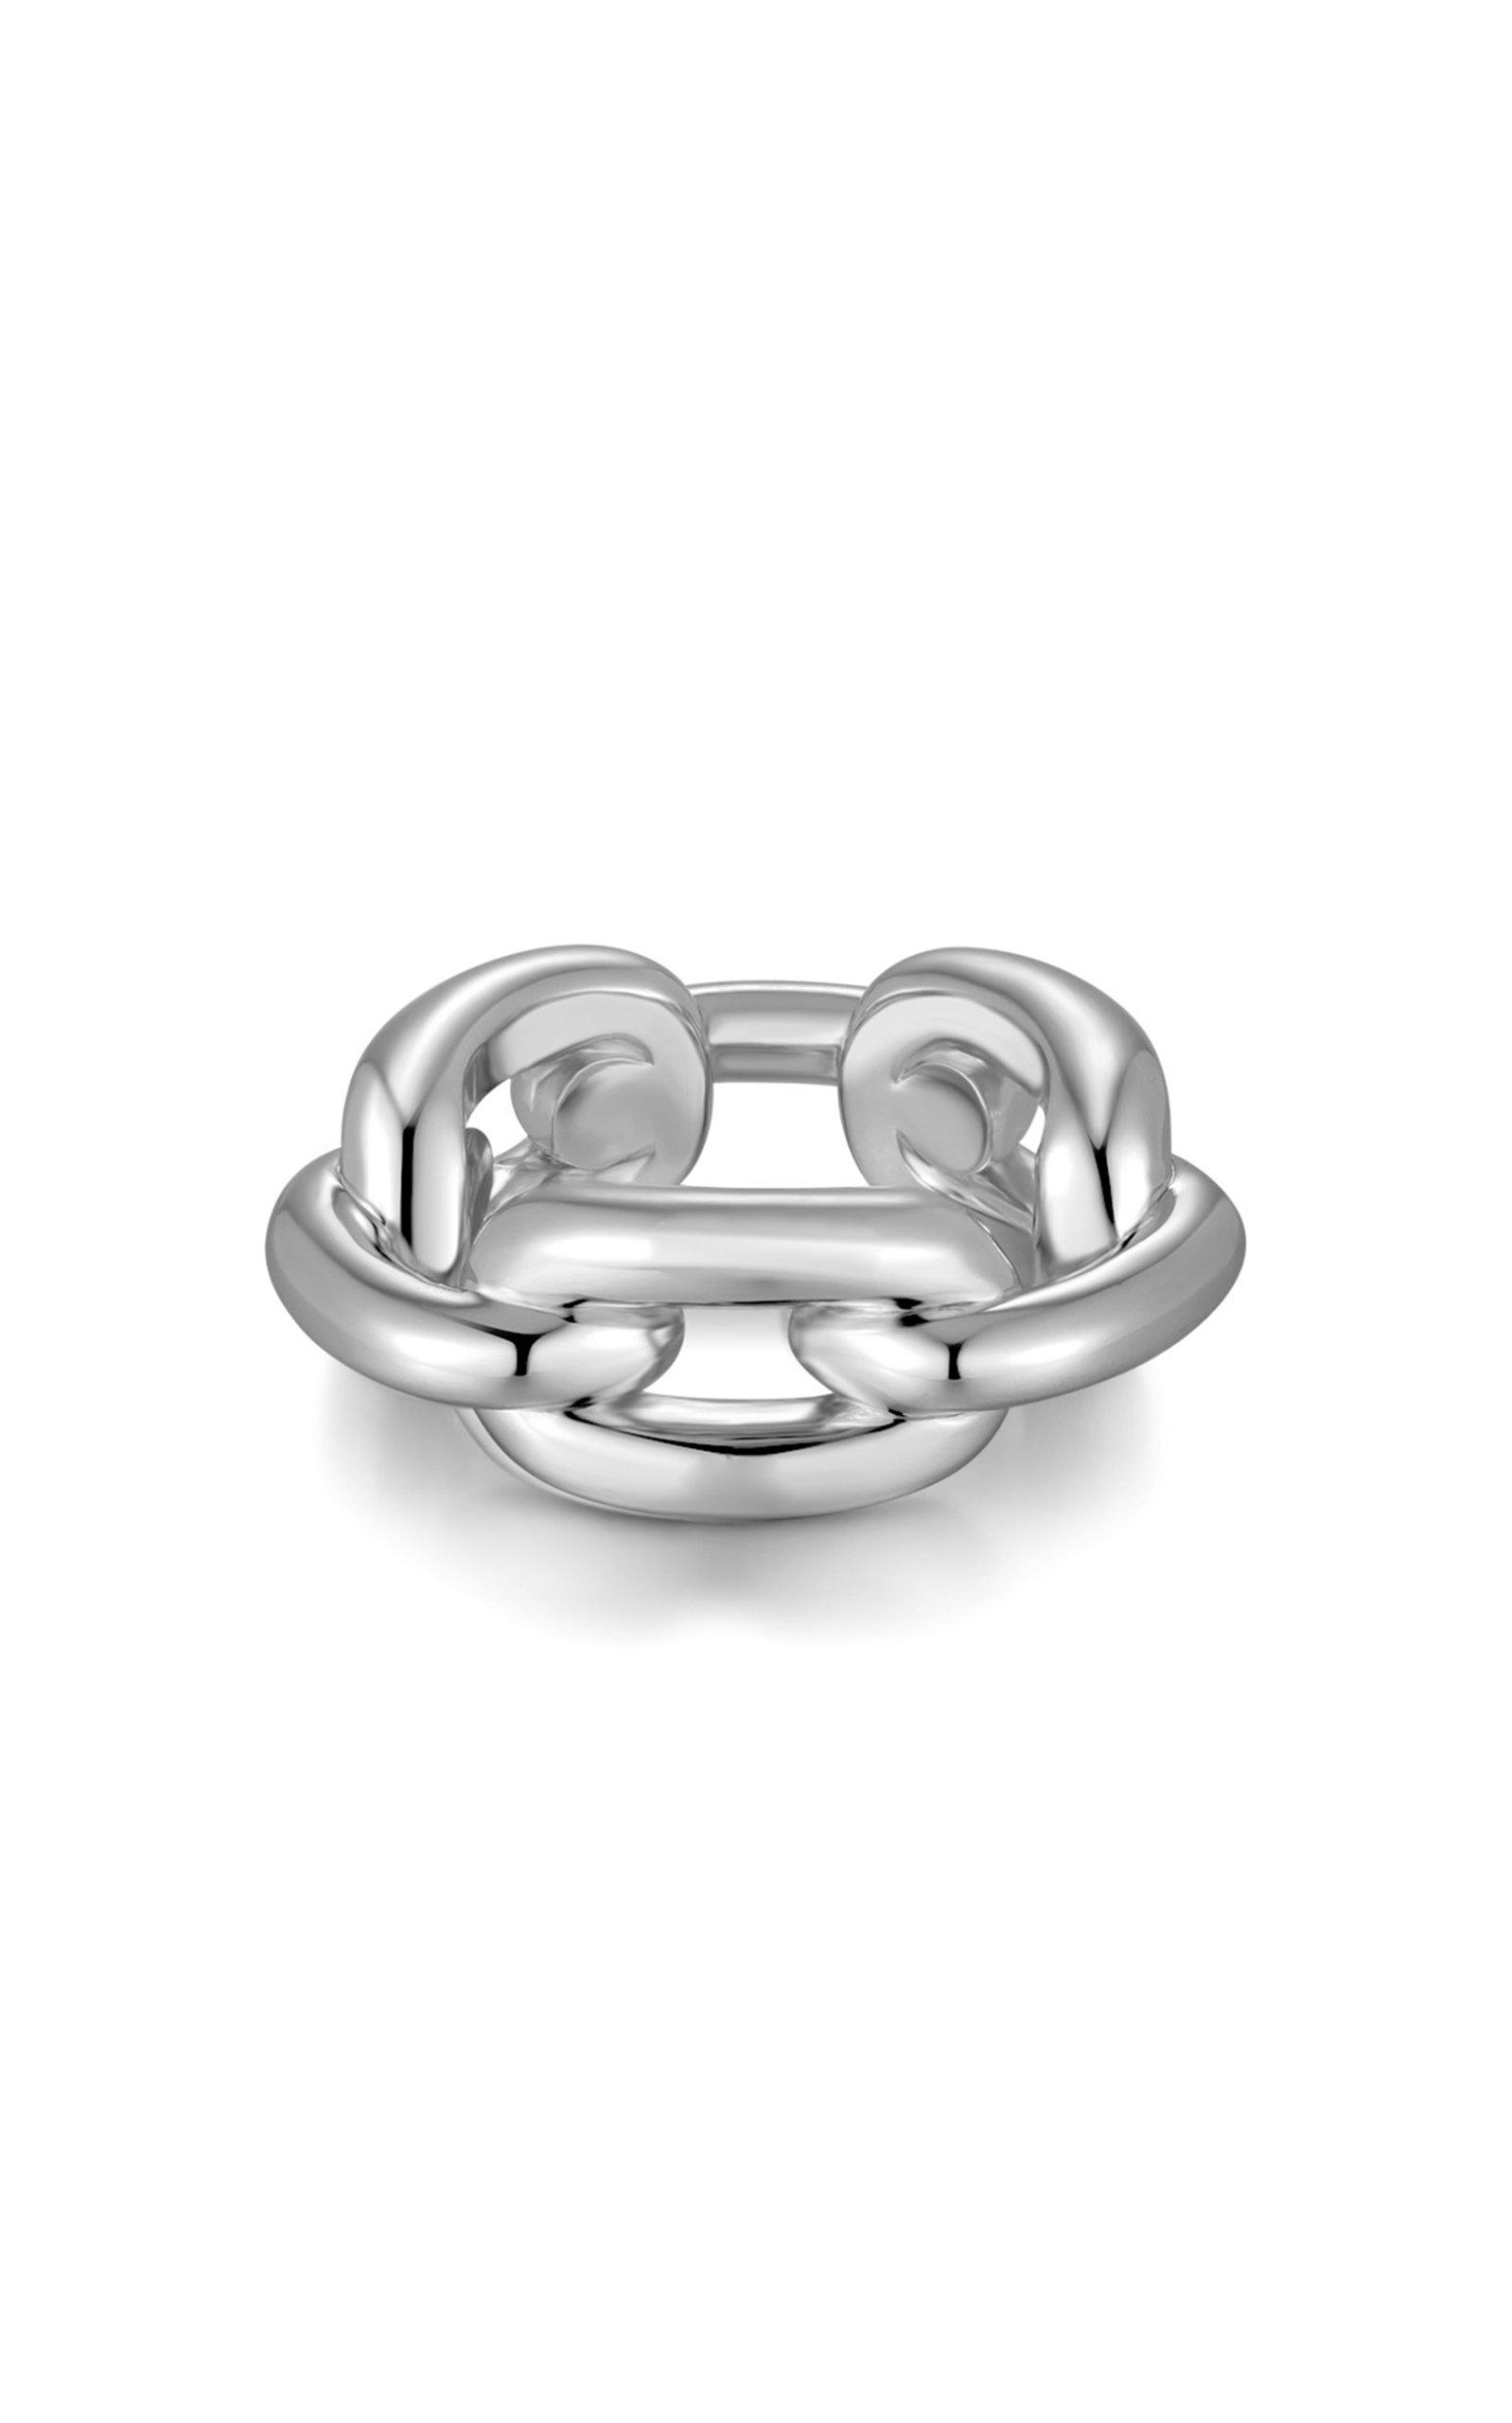 Emili - Women's Sterling Silver Rory Ring - Silver - Moda Operandi